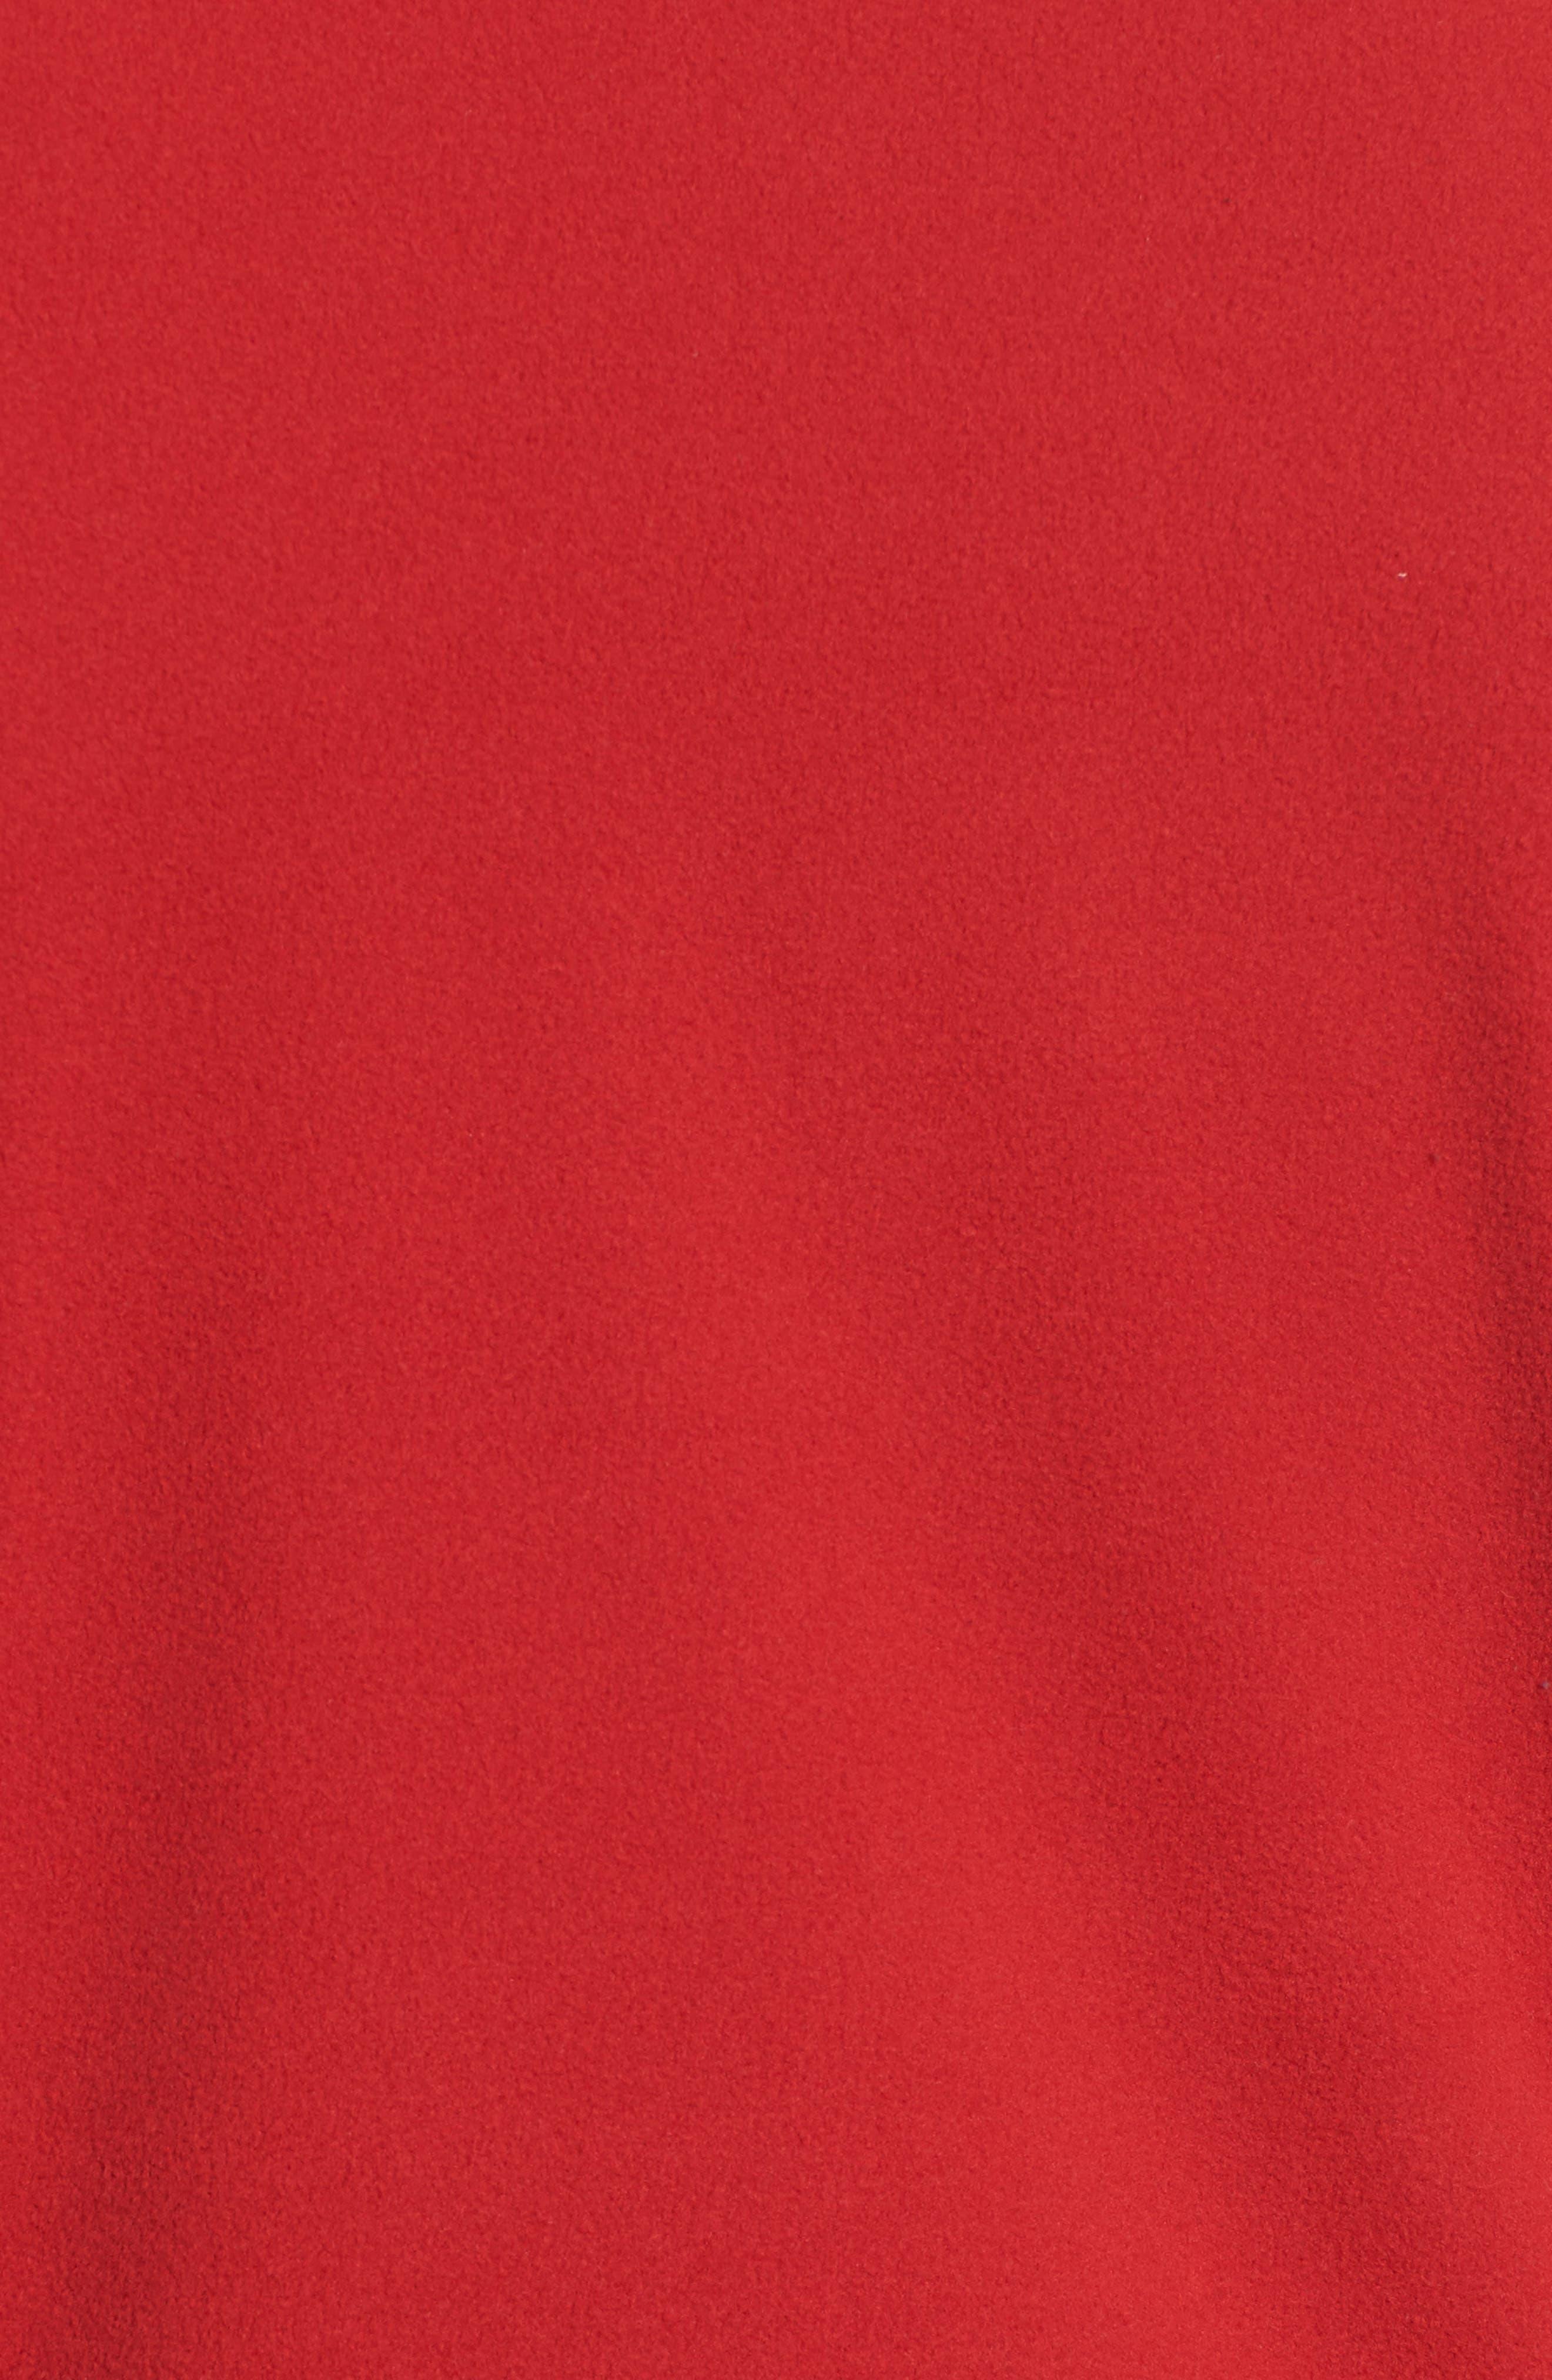 'TKA 100 Glacier' Quarter Zip Fleece Pullover,                             Alternate thumbnail 5, color,                             RAGE RED/ RAGE RED